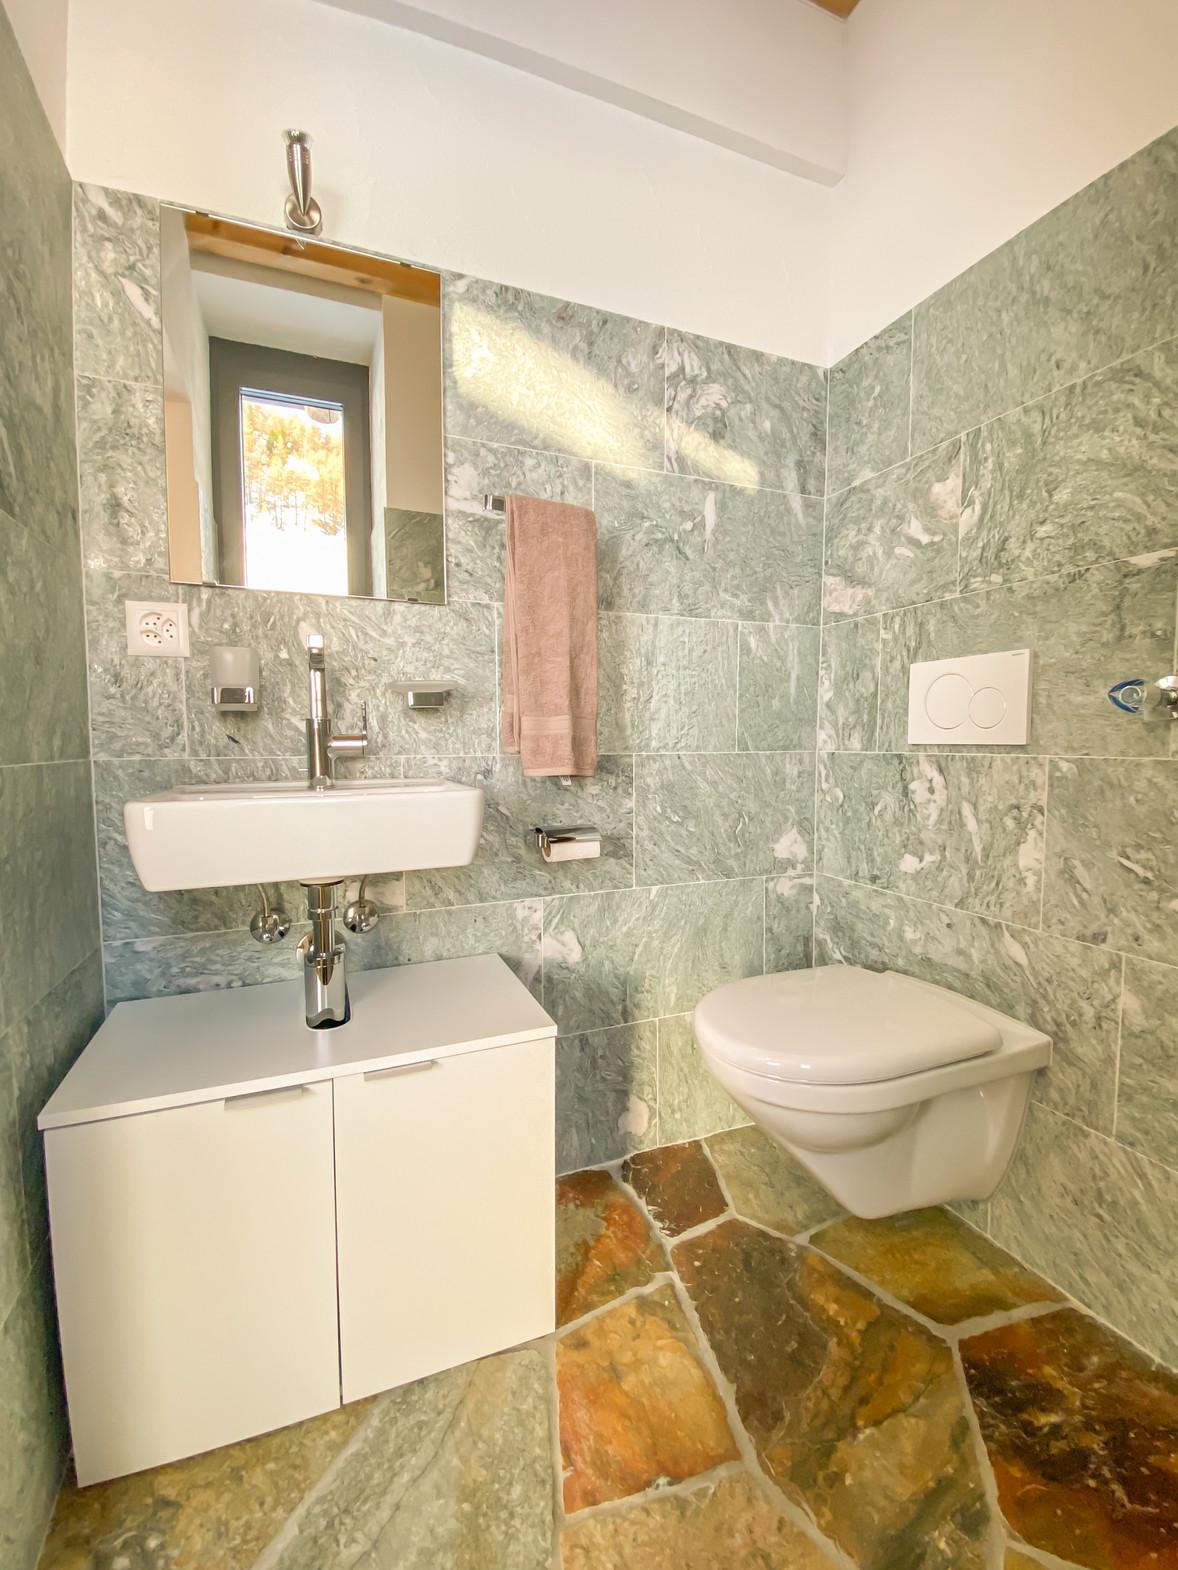 Badezimmer 2 Casa bellavista isola Ferie